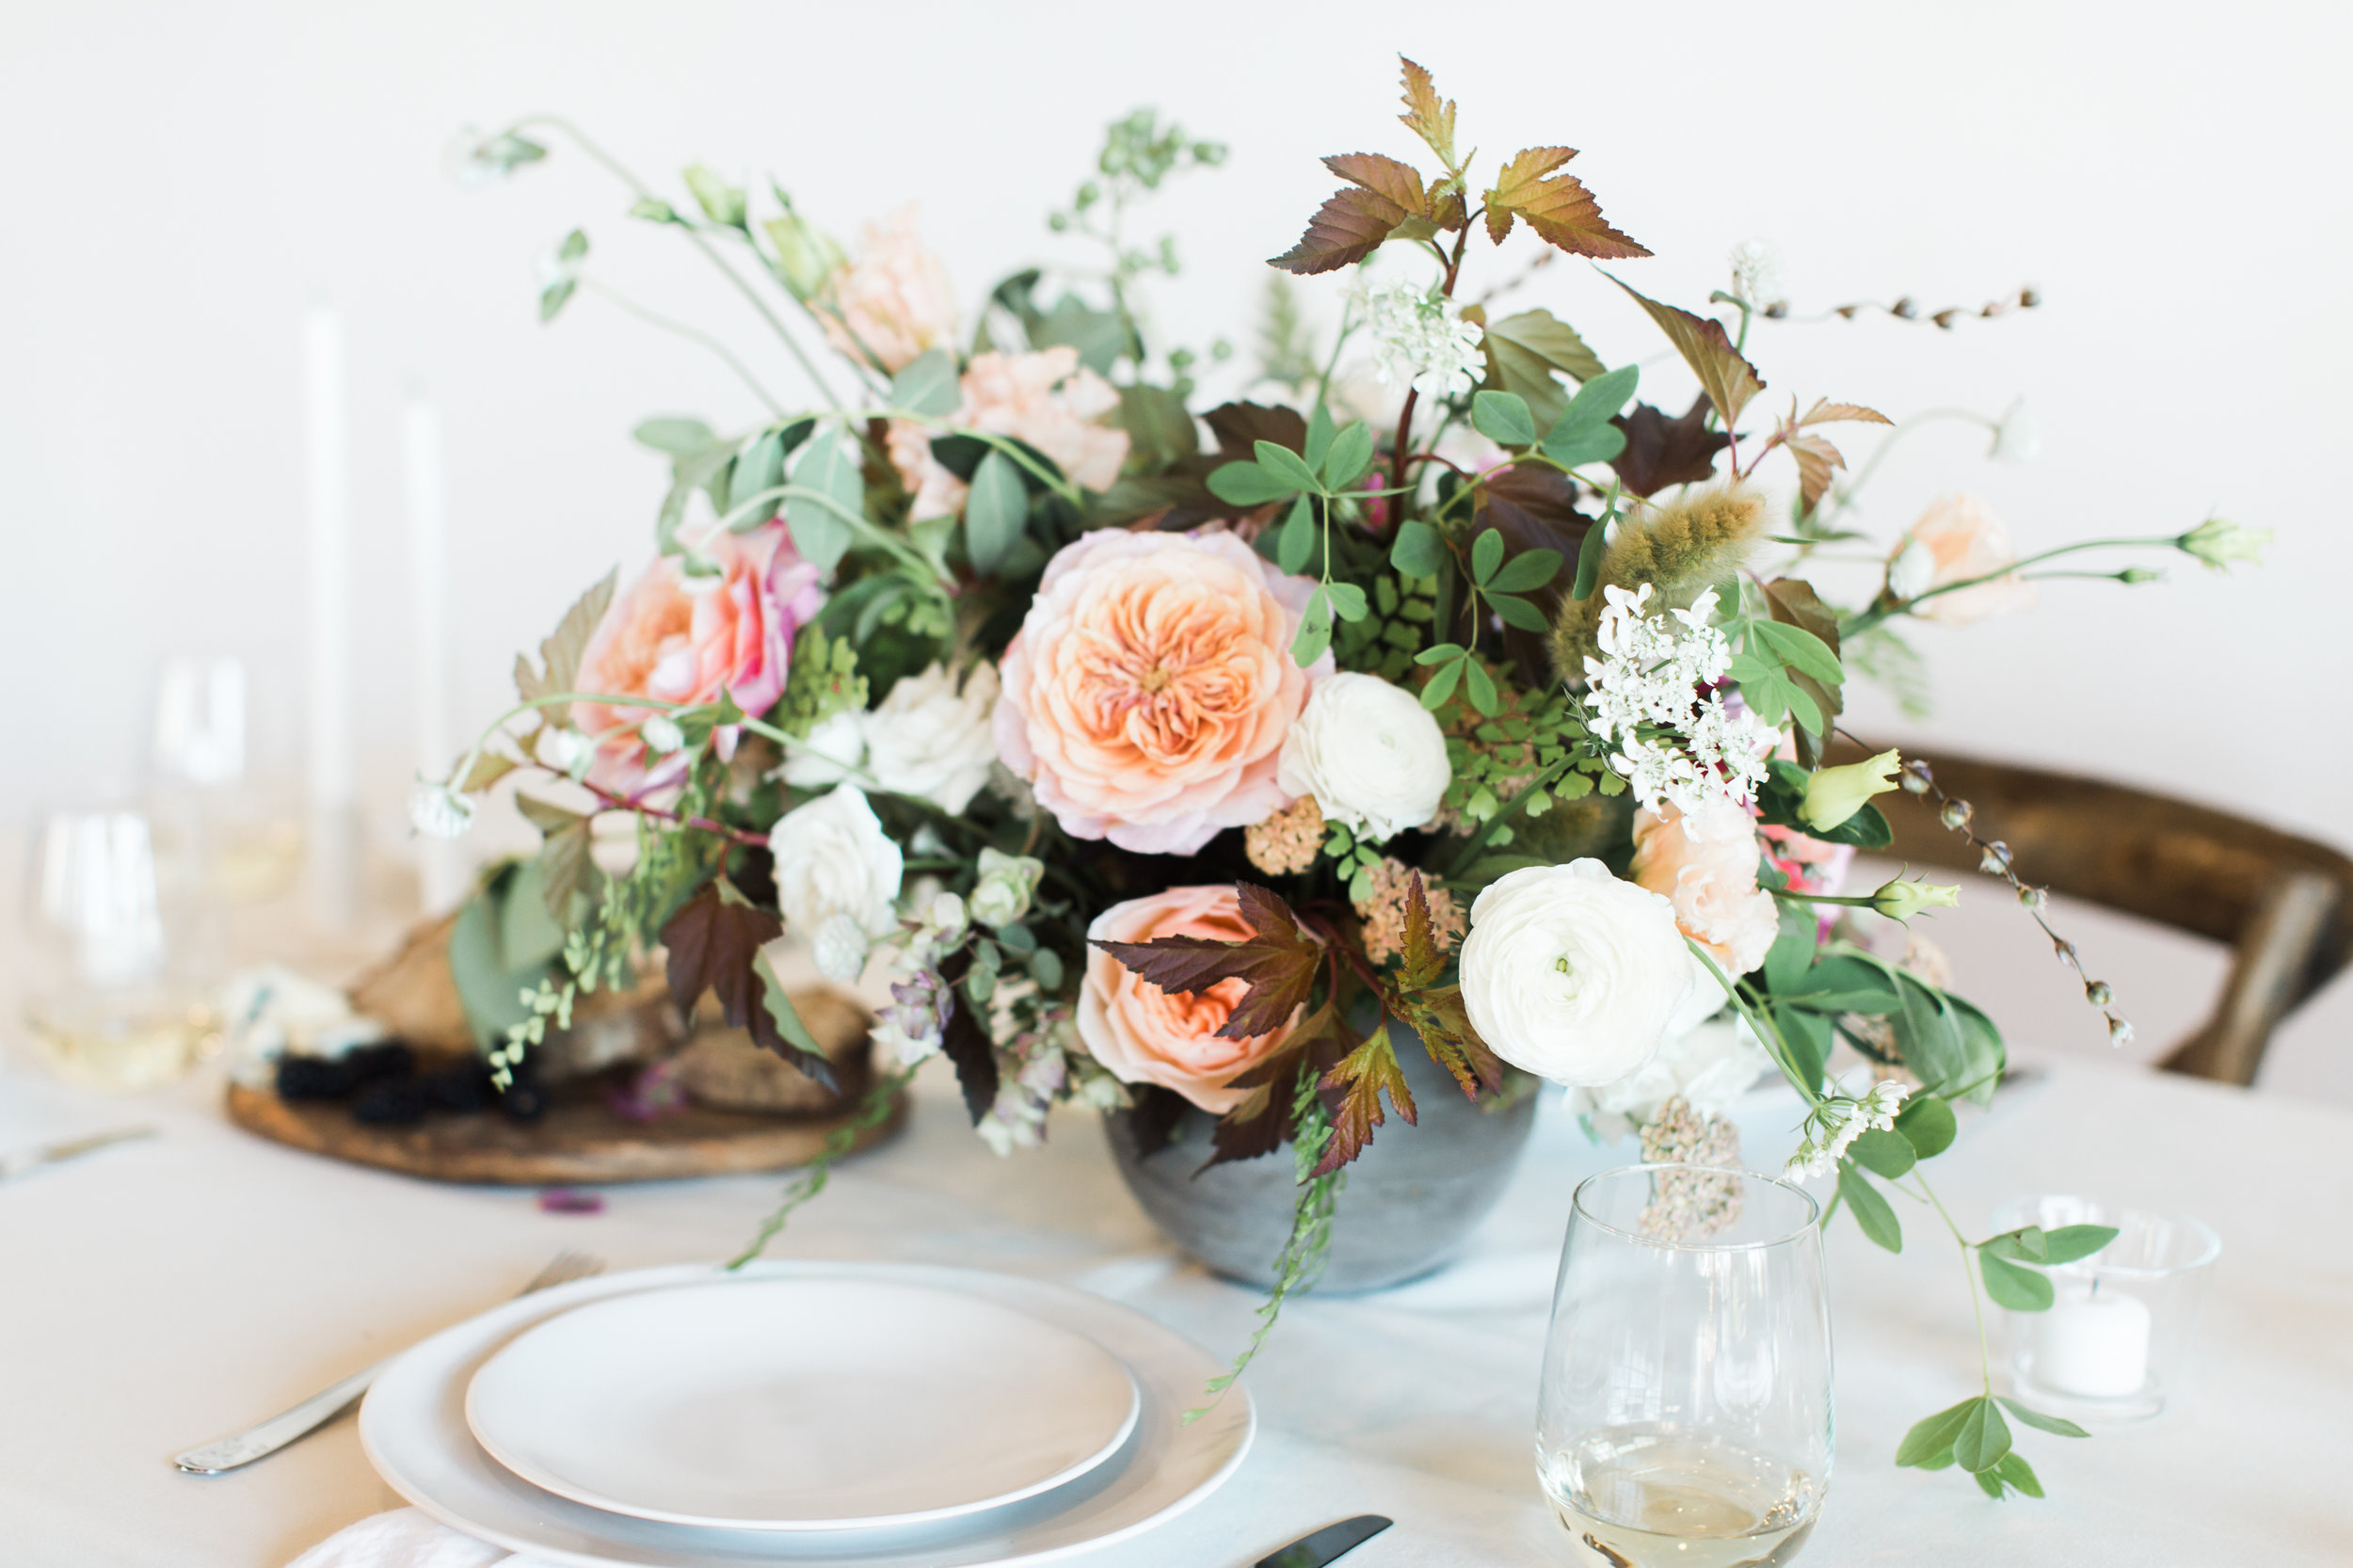 ashley-eileen-floral-design1.jpg